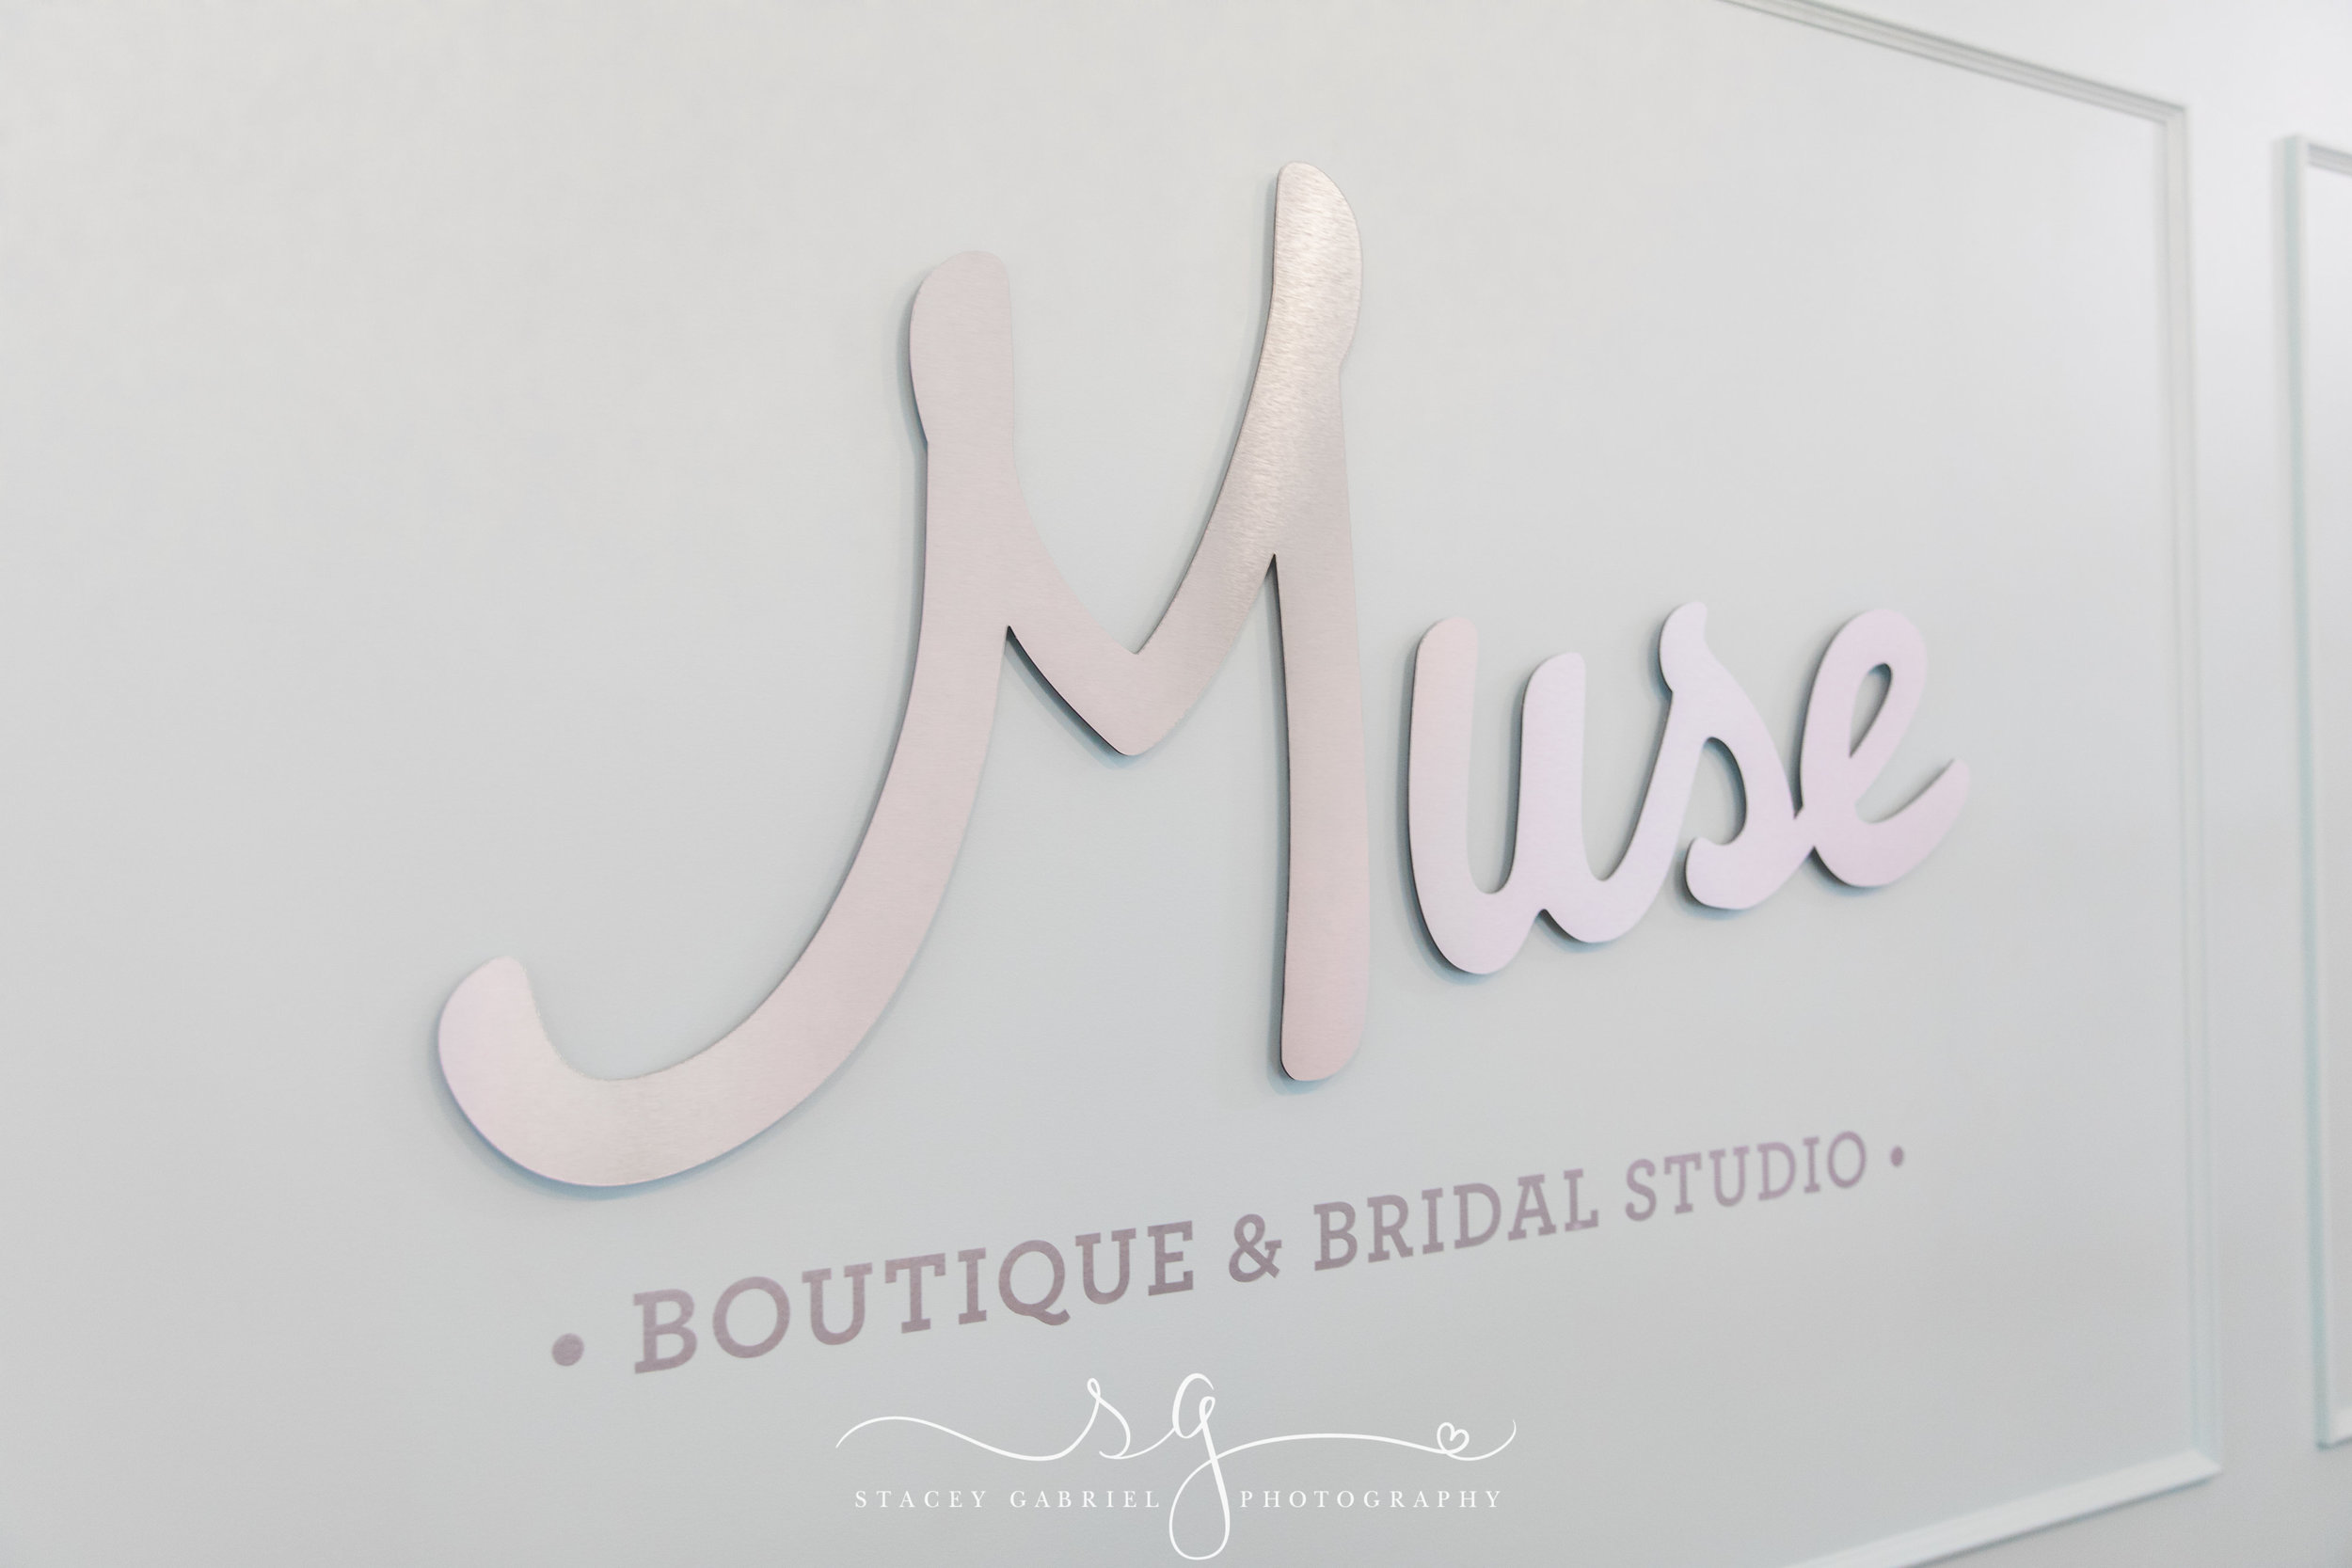 Muse Logo-done1-0068.jpg